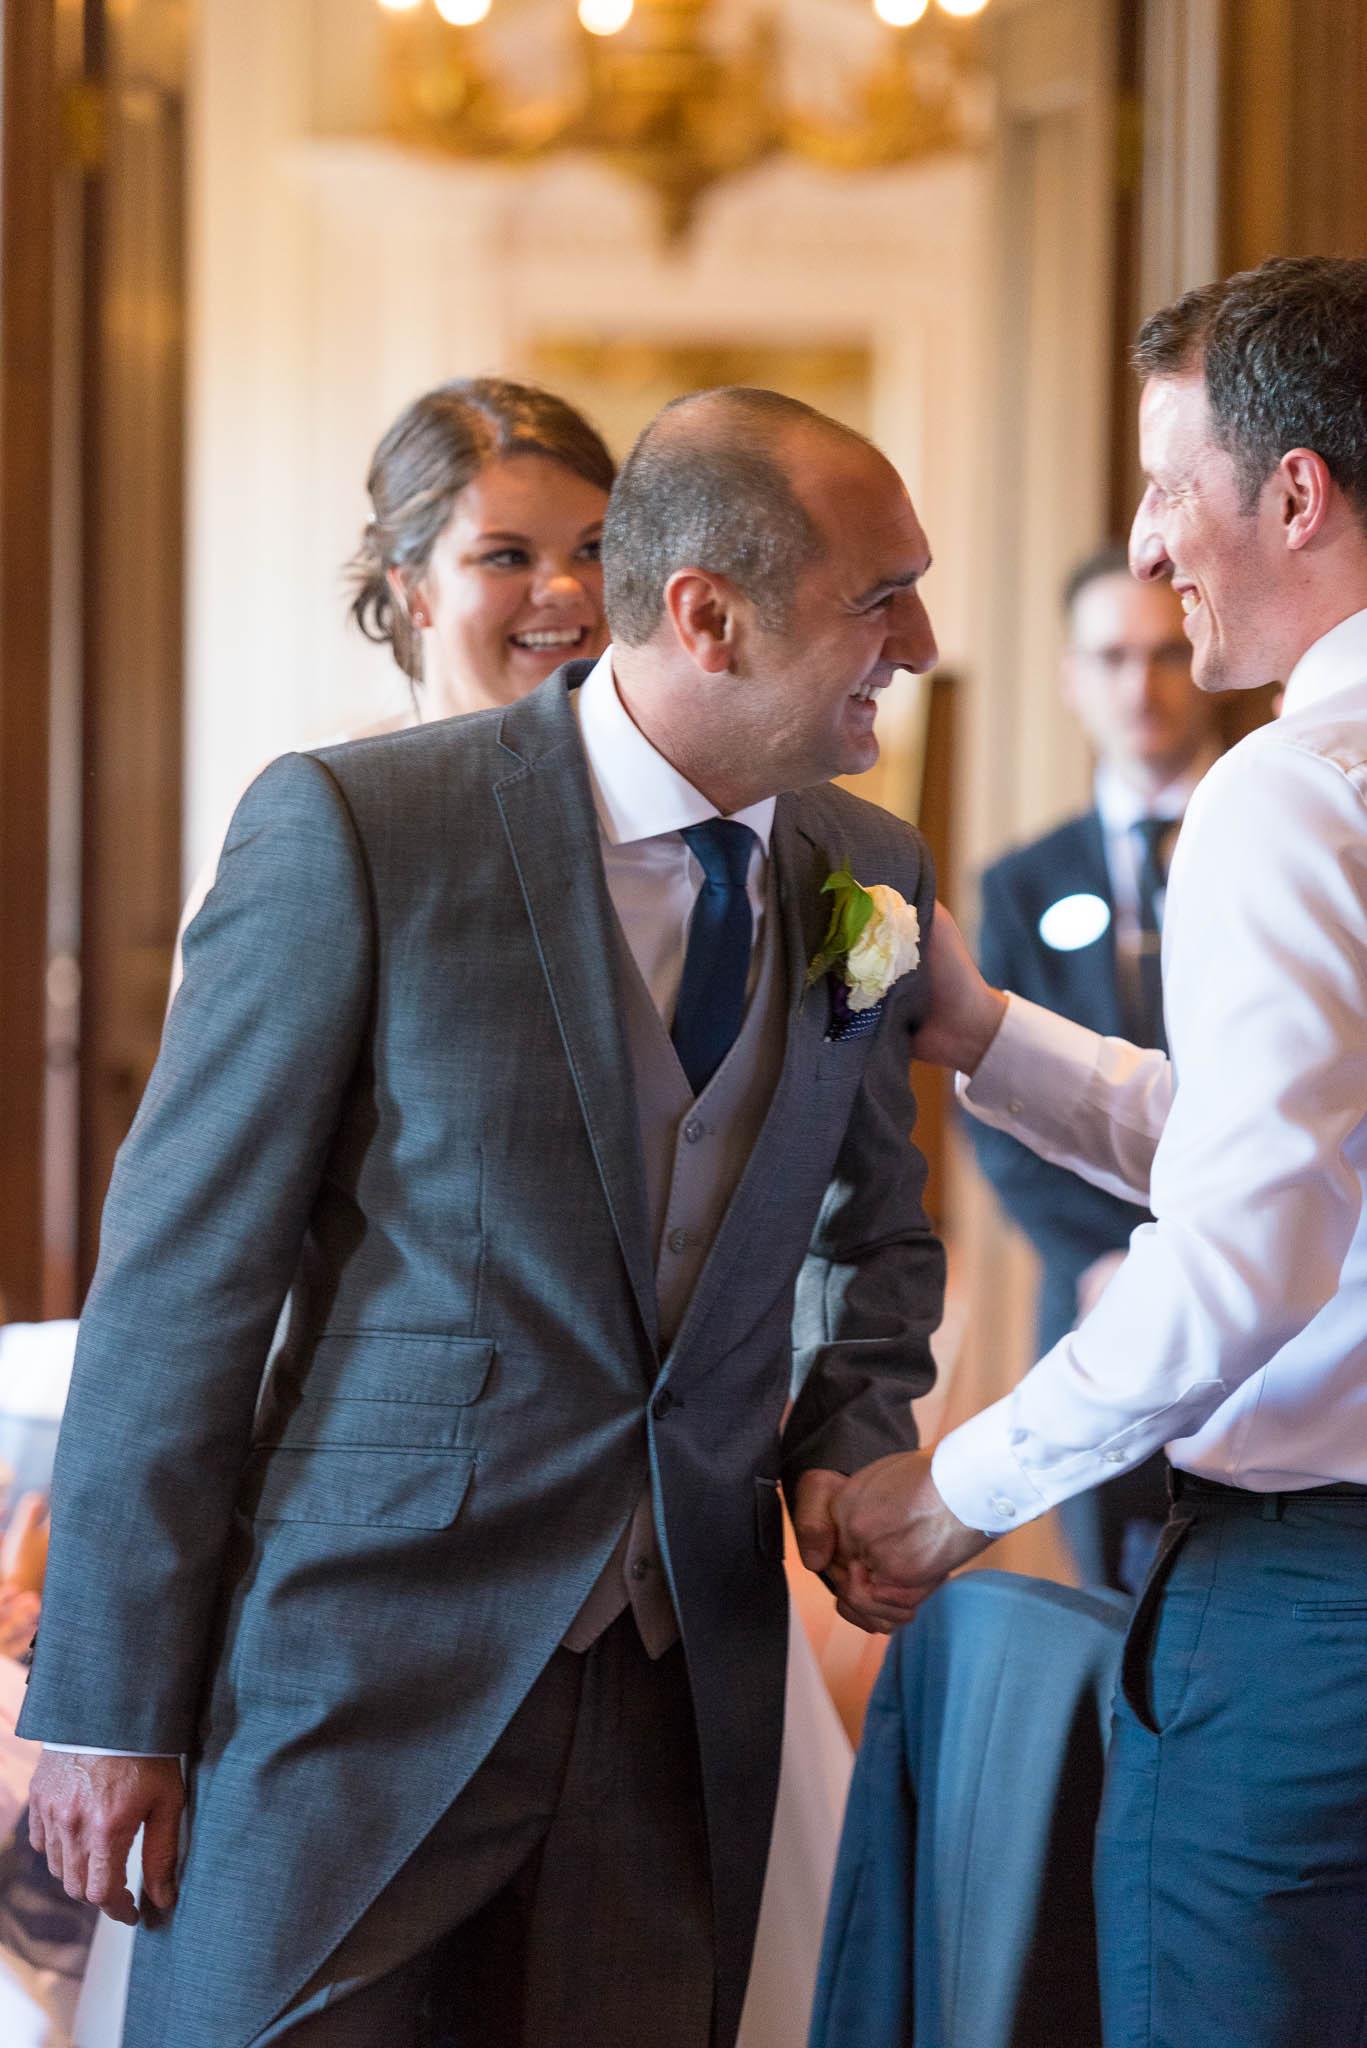 Crathorne Hall Hotel Wedding Photographer77.jpg